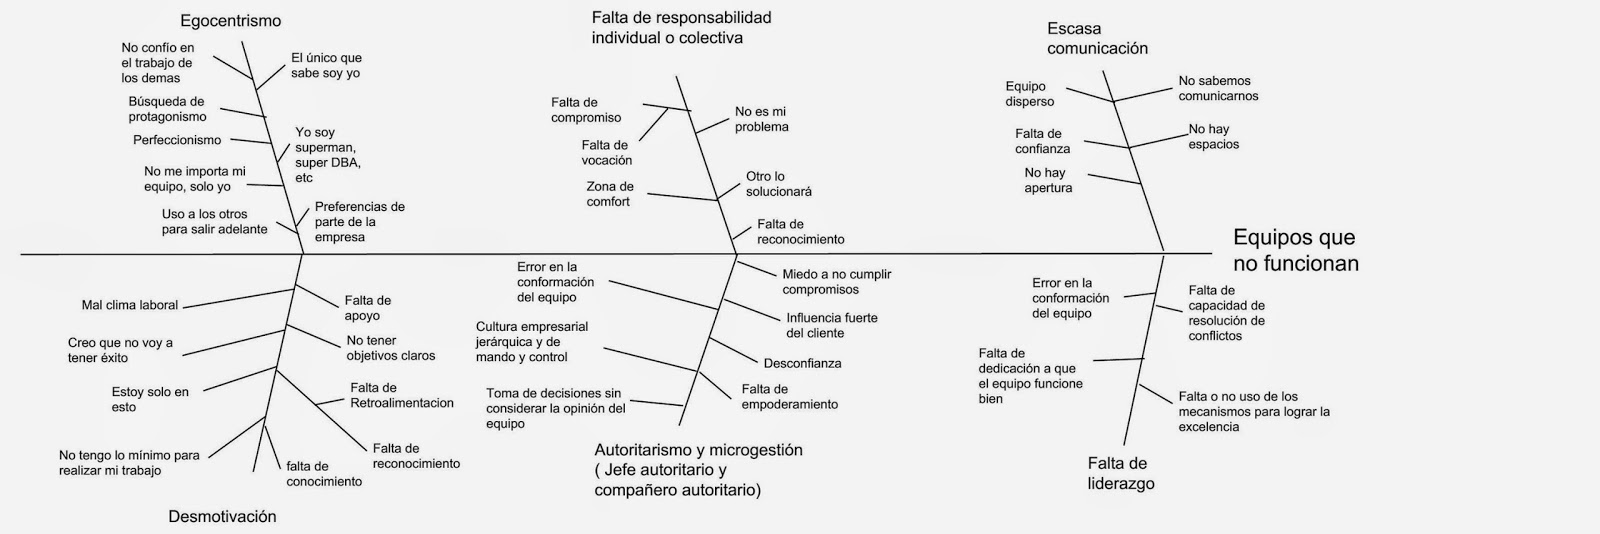 Excepcional Plantilla De Etiquetas De Espina Composición - Colección ...